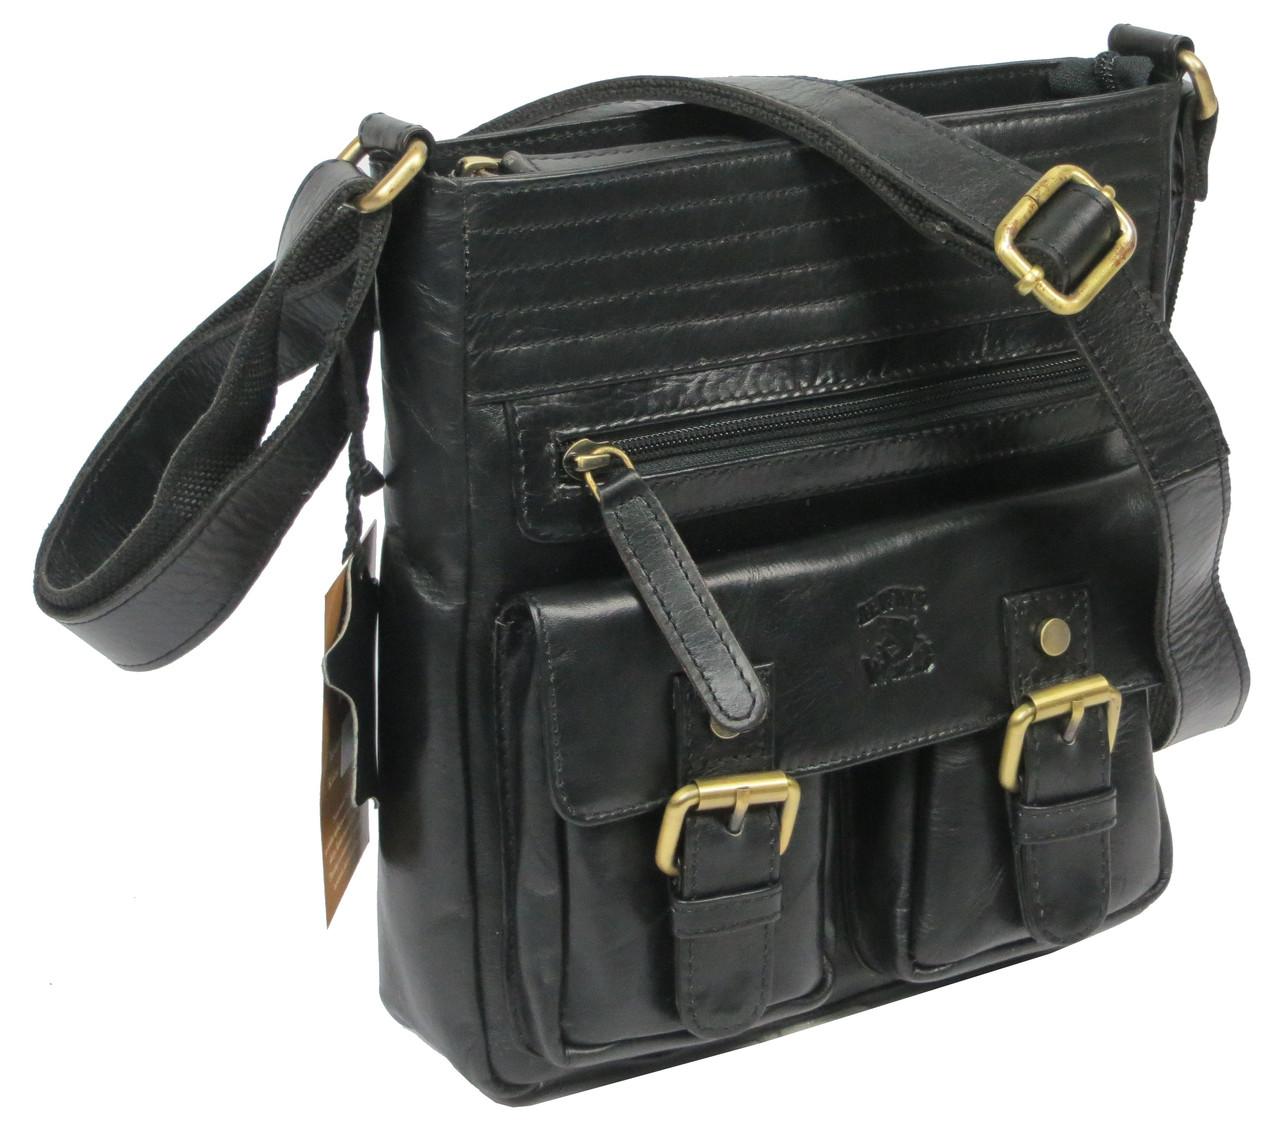 Мужская кожаная сумка Always Wild C48.0525 черная